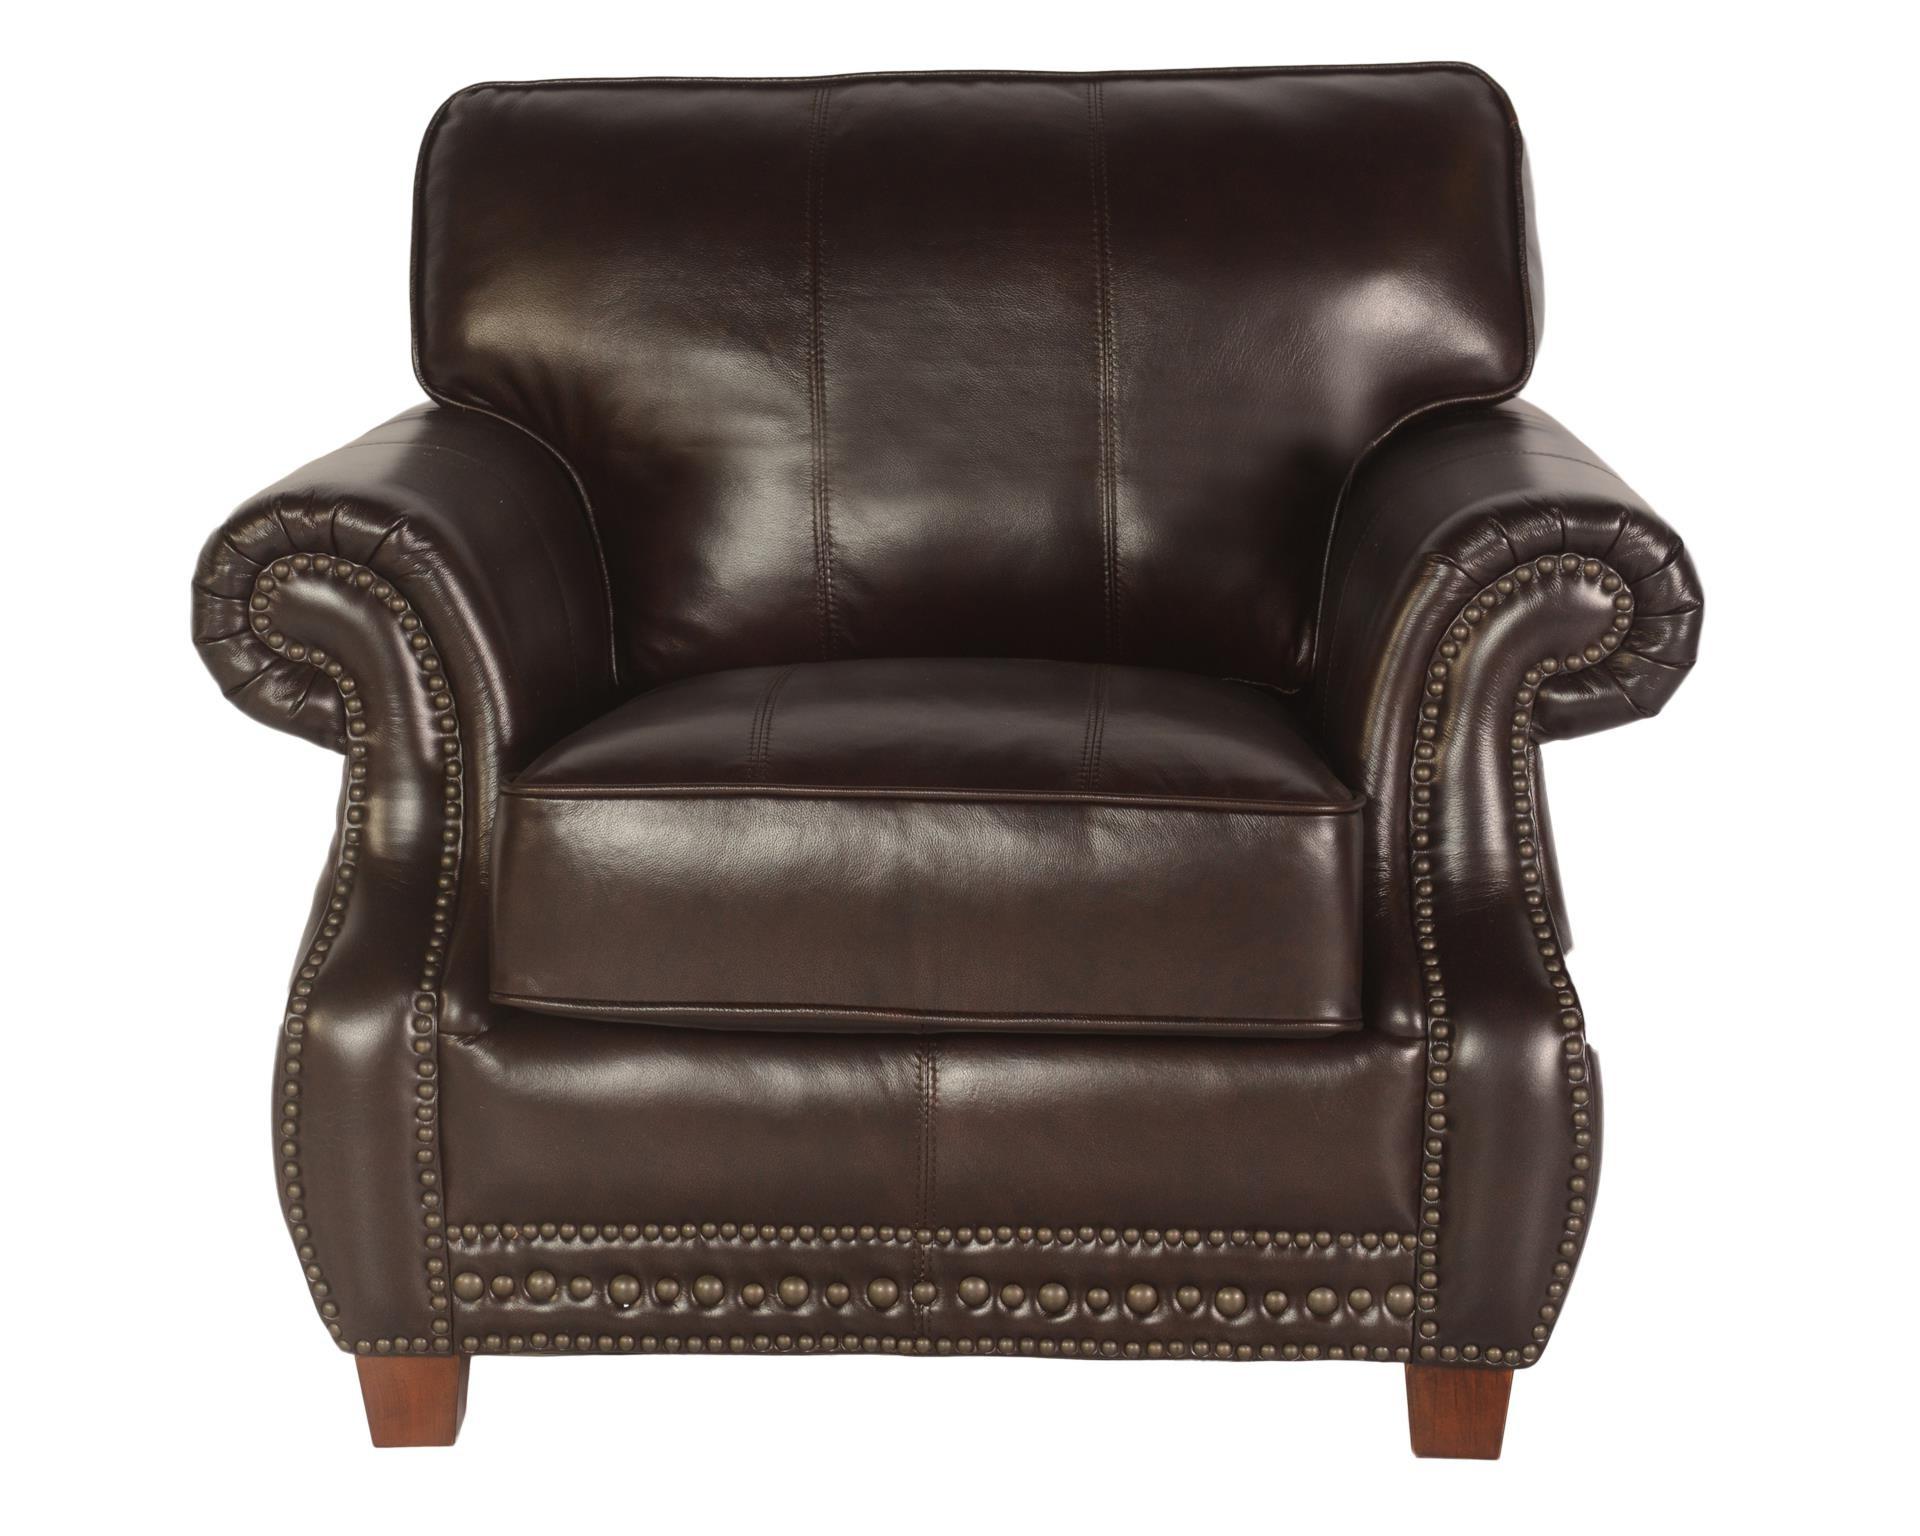 Lazzaro Leather (View 9 of 20)